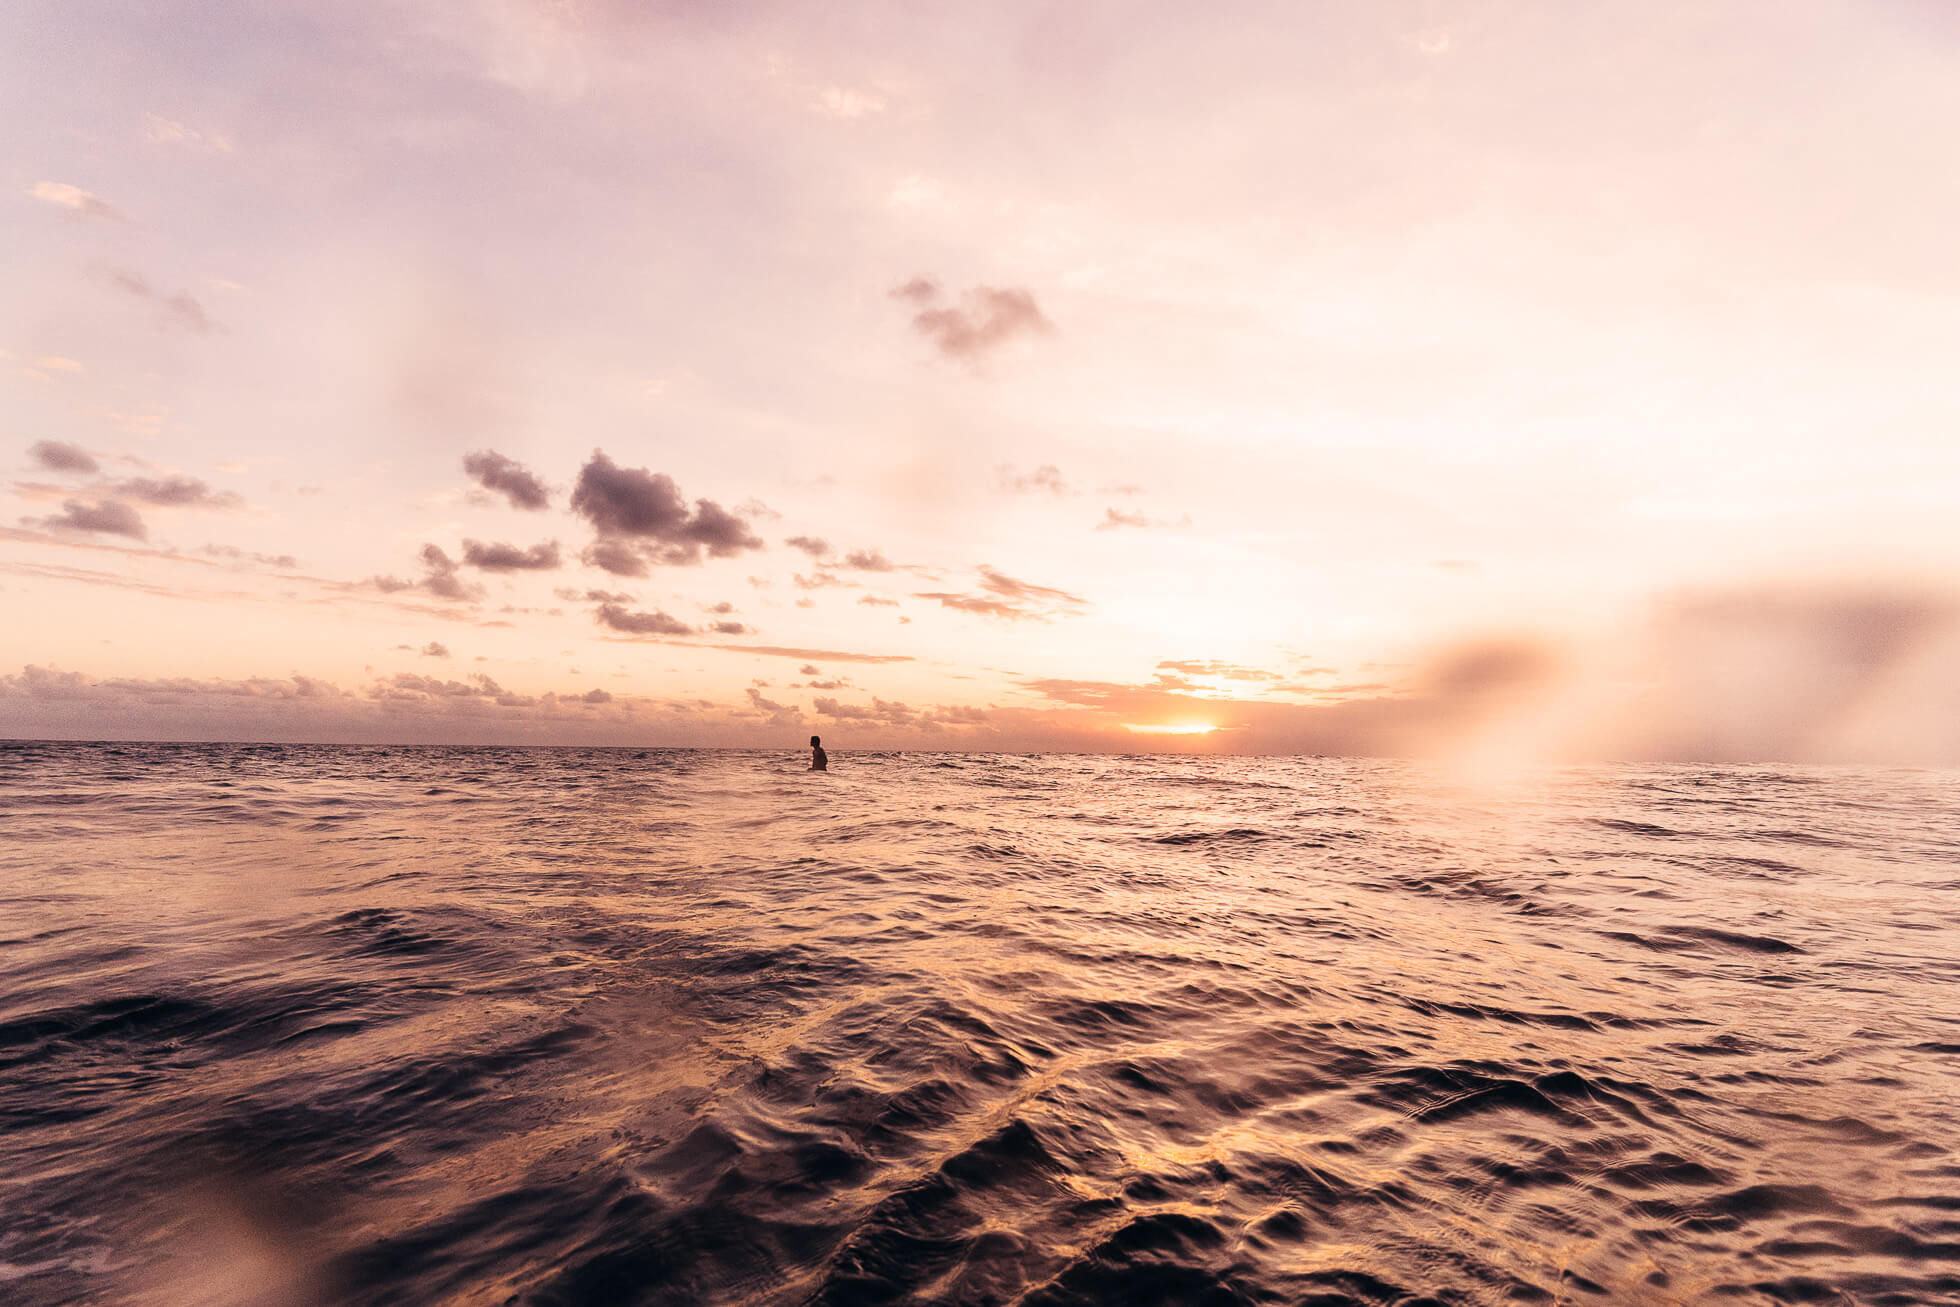 janni-deler-sunset-surf-baliJ1200251-Redigera